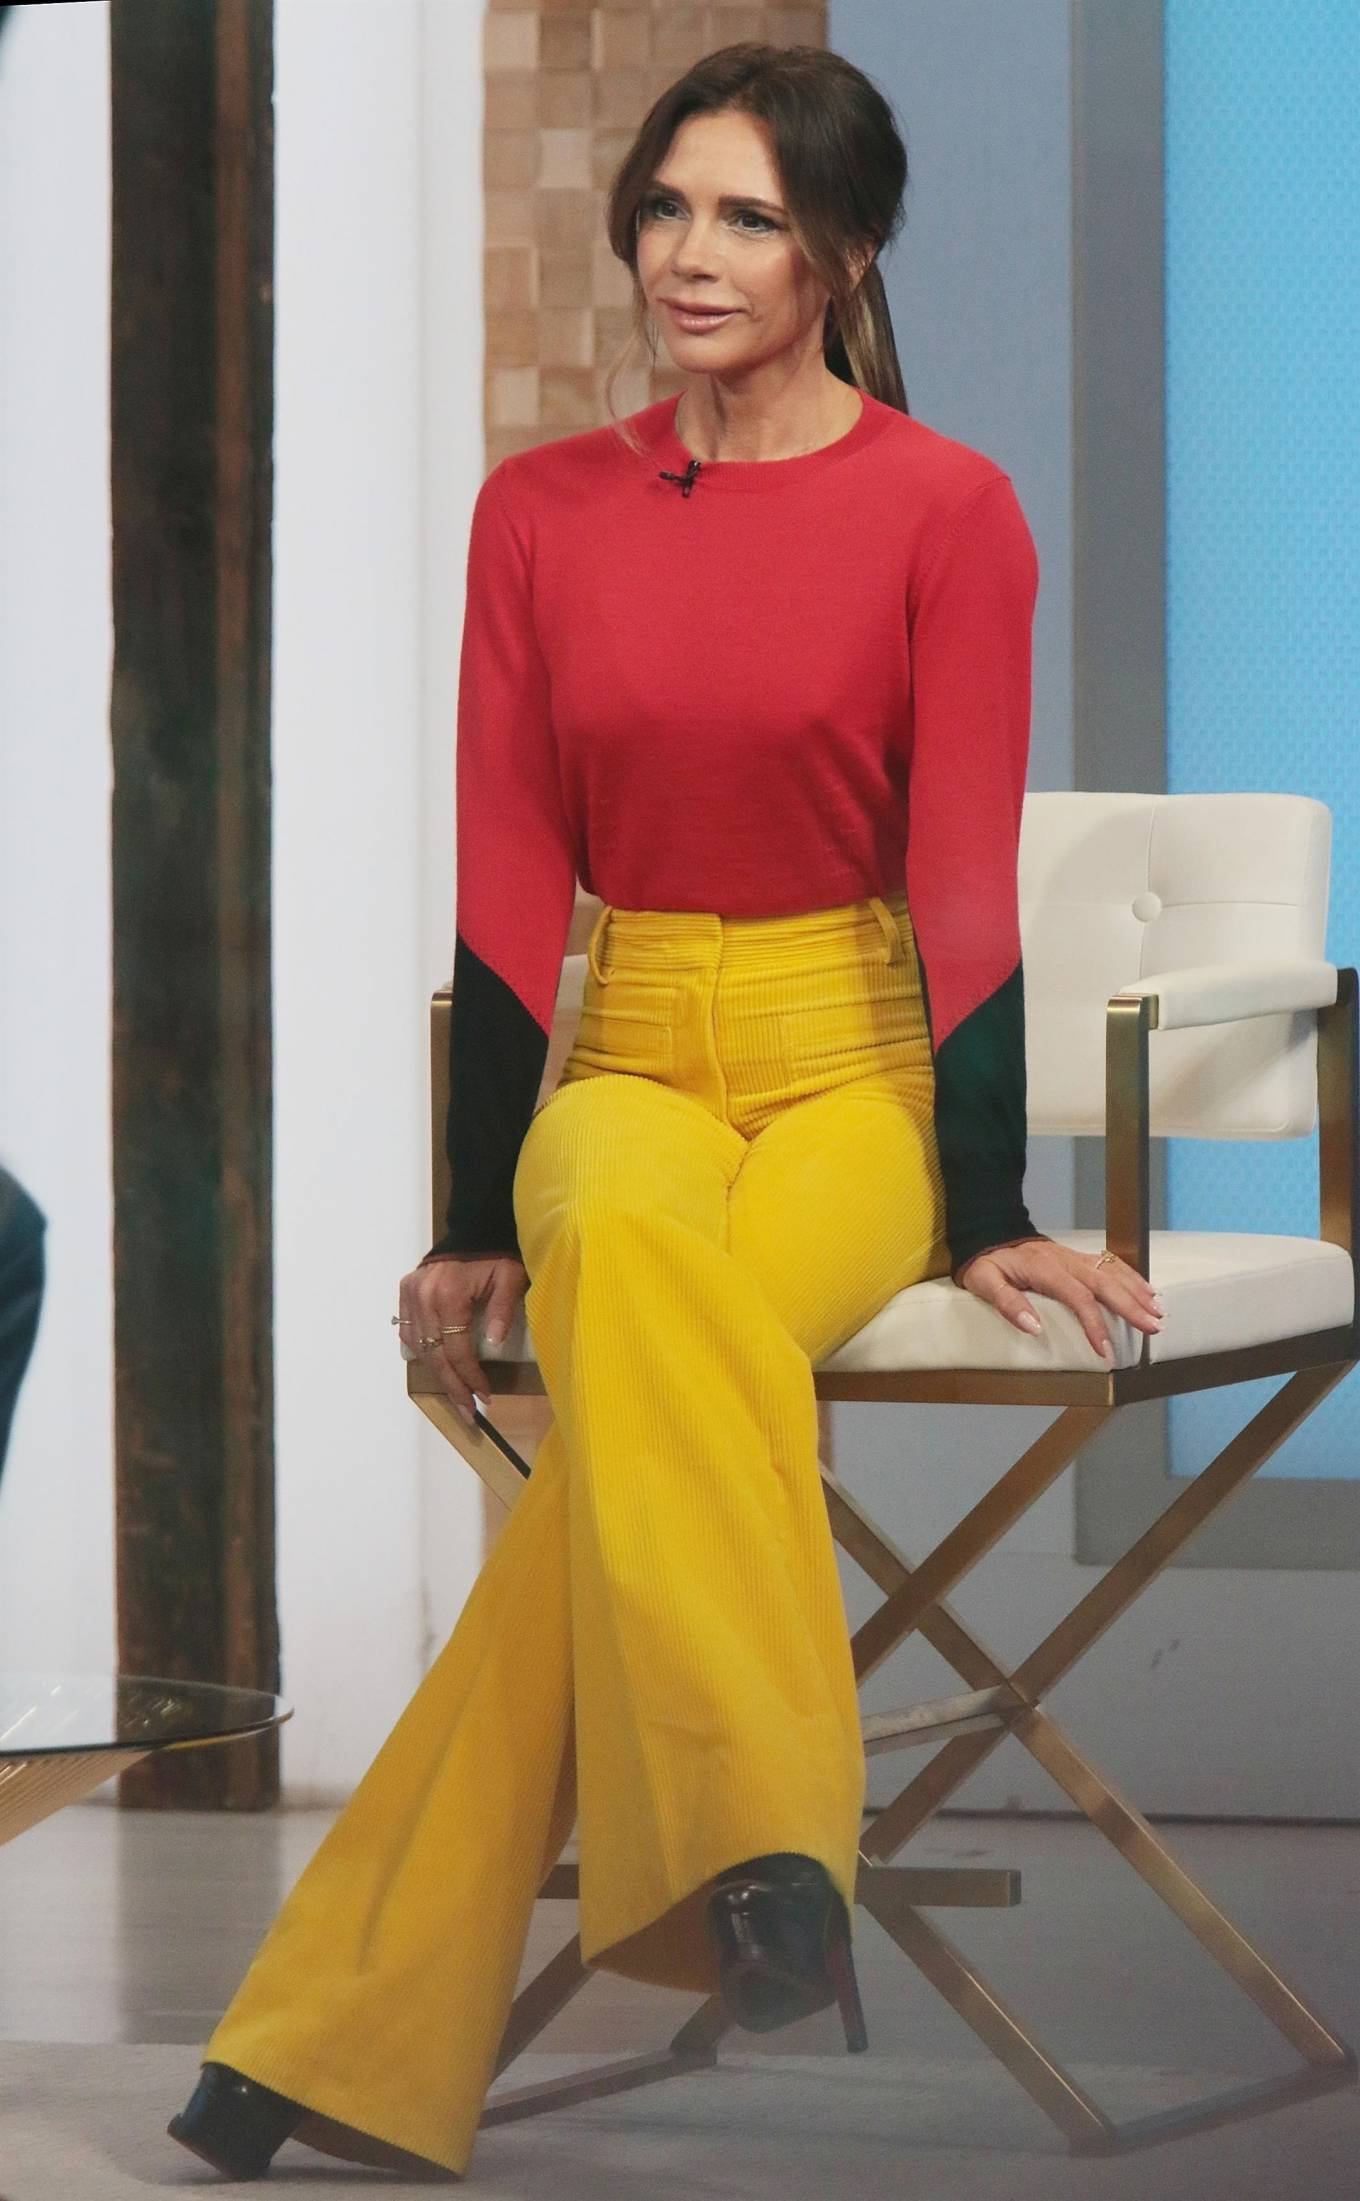 Victoria Beckham 2021 : Victoria Beckham – on Good Morning America promoting her new designer clothing in New York City-43